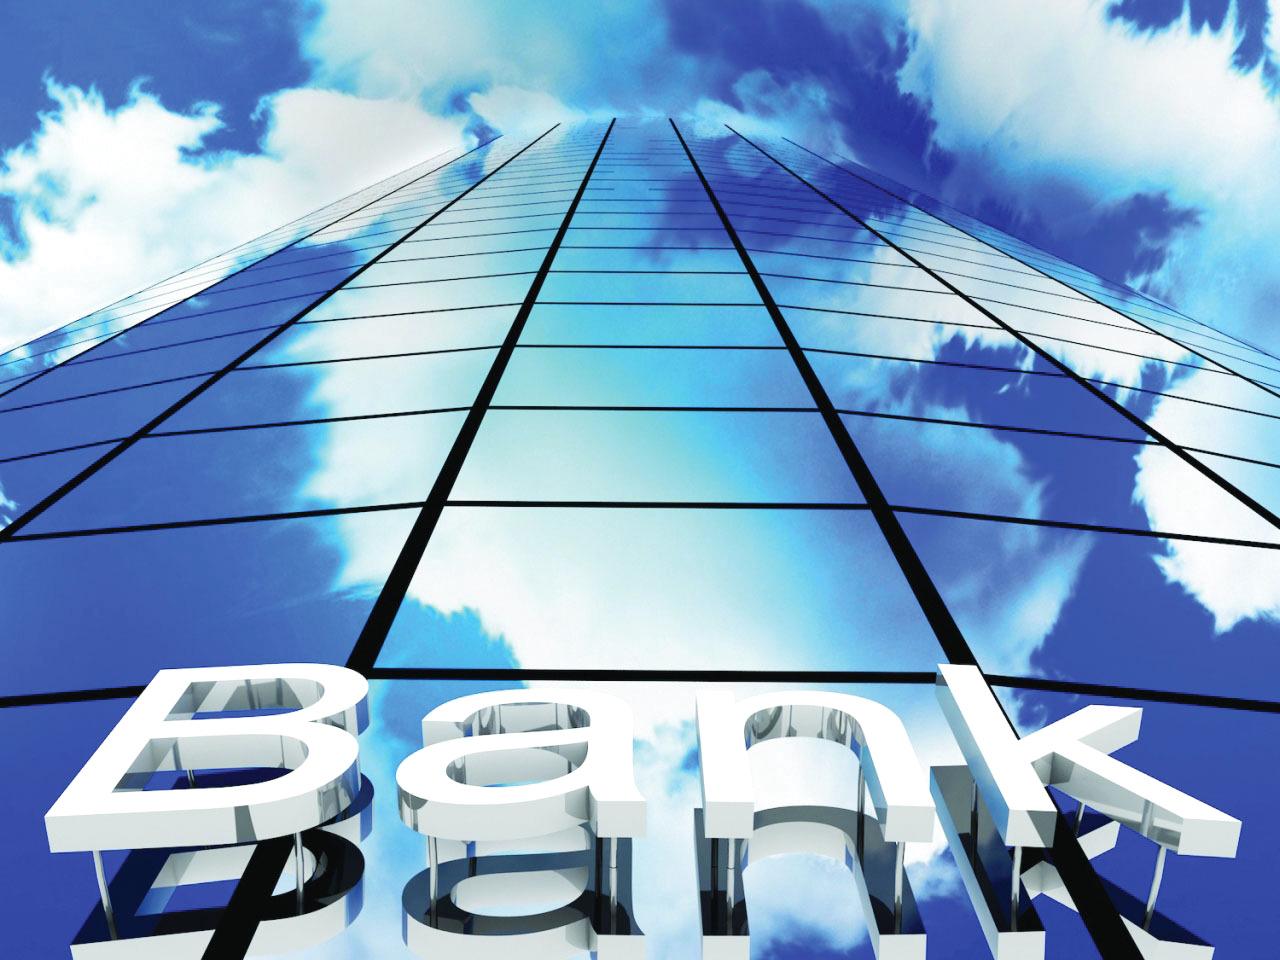 بنوك تُعيد افتتاح فروعها مع قيود مؤقّتة